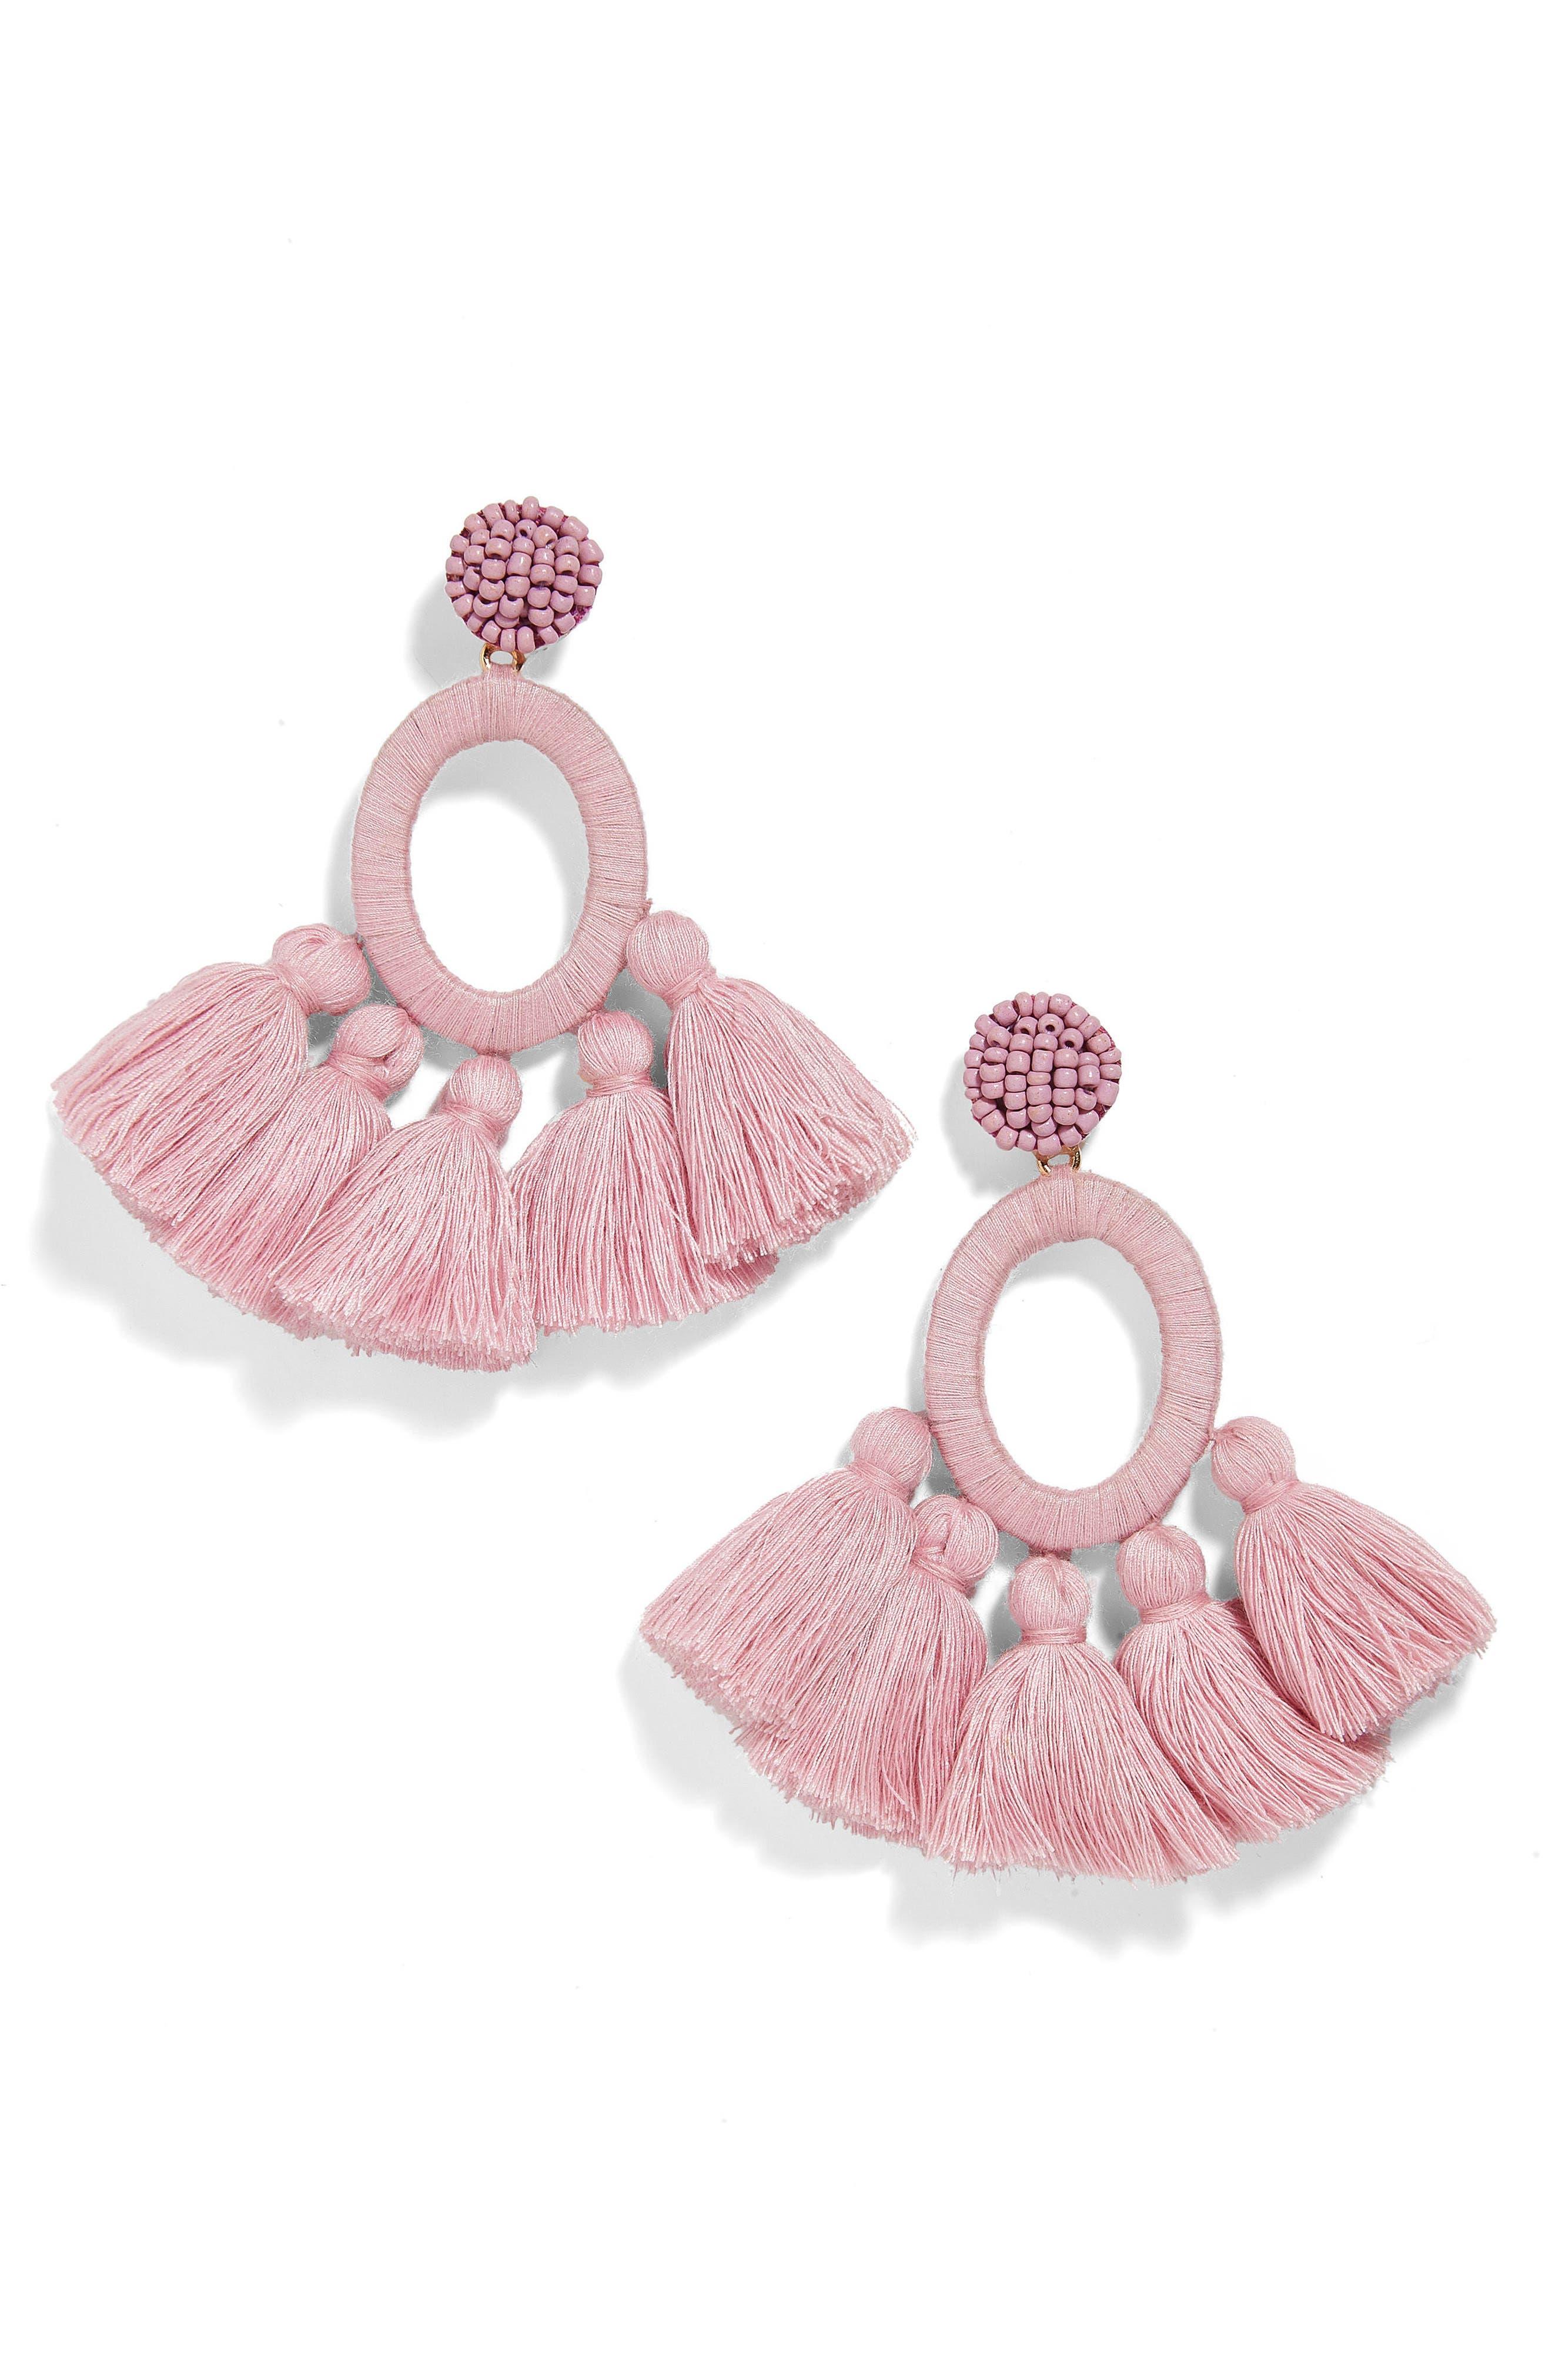 Abacos Tassel Earrings,                             Main thumbnail 1, color,                             BLUSH